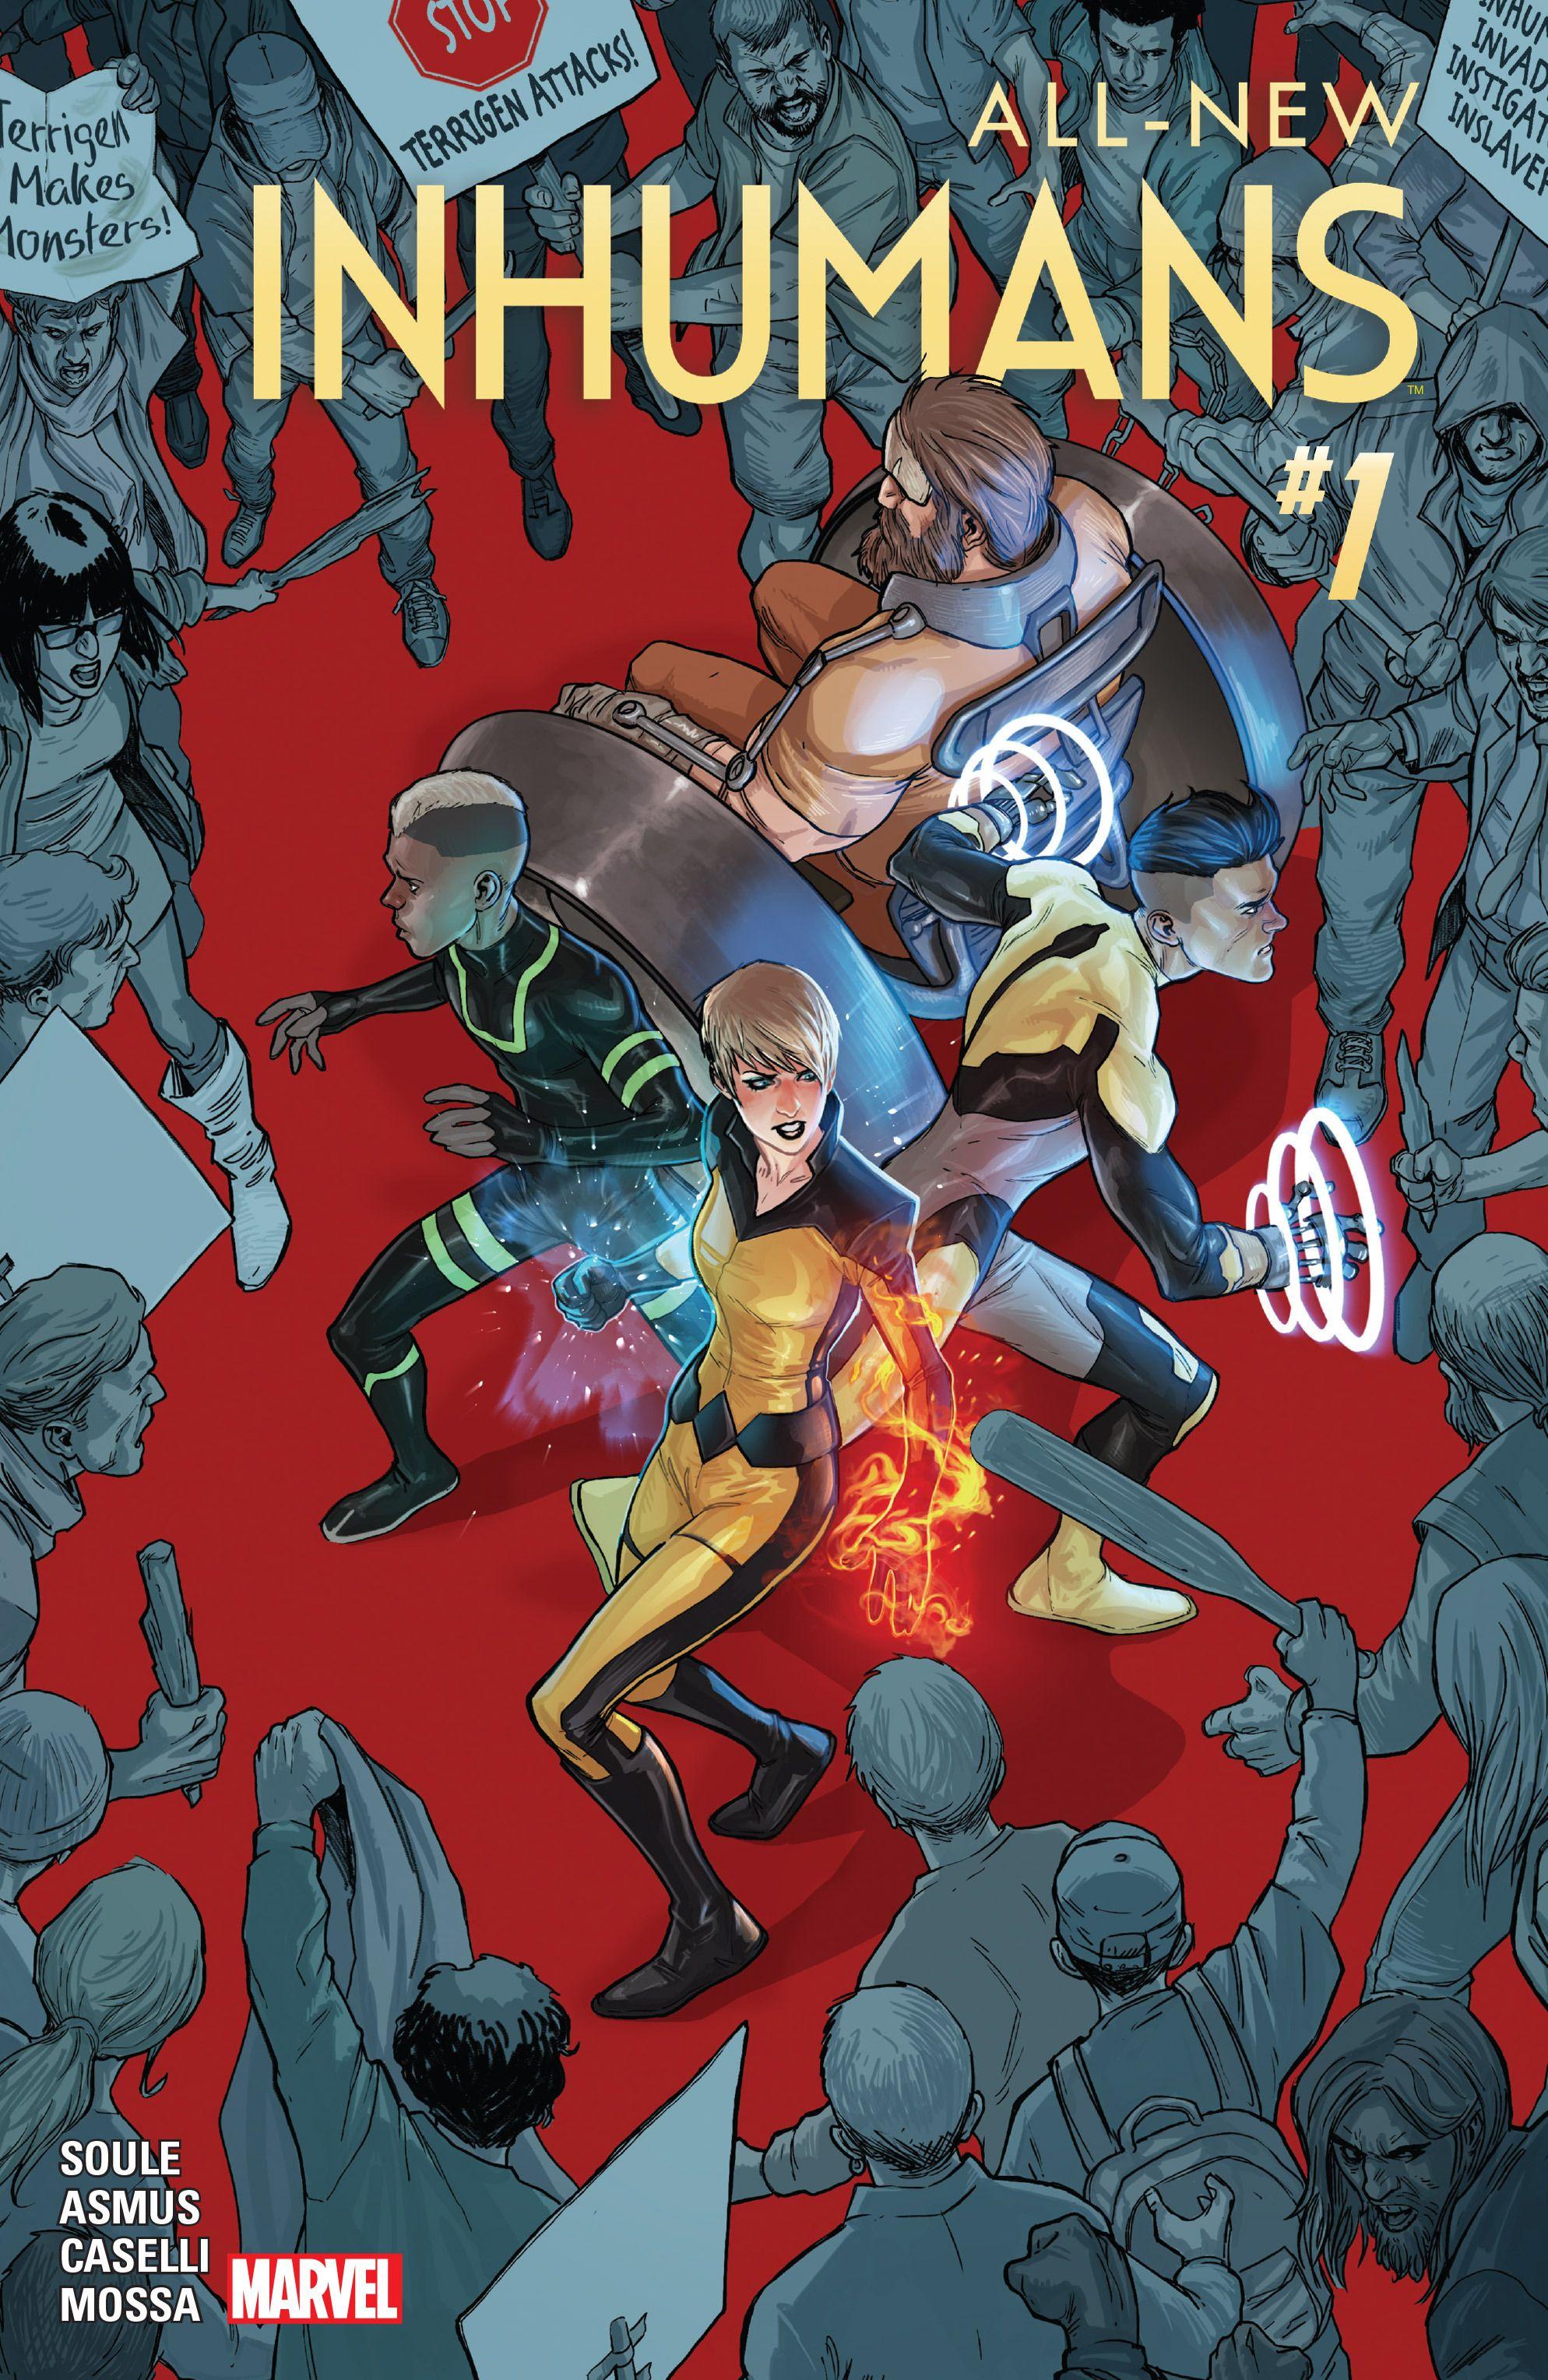 All new inhumans comic cover komik